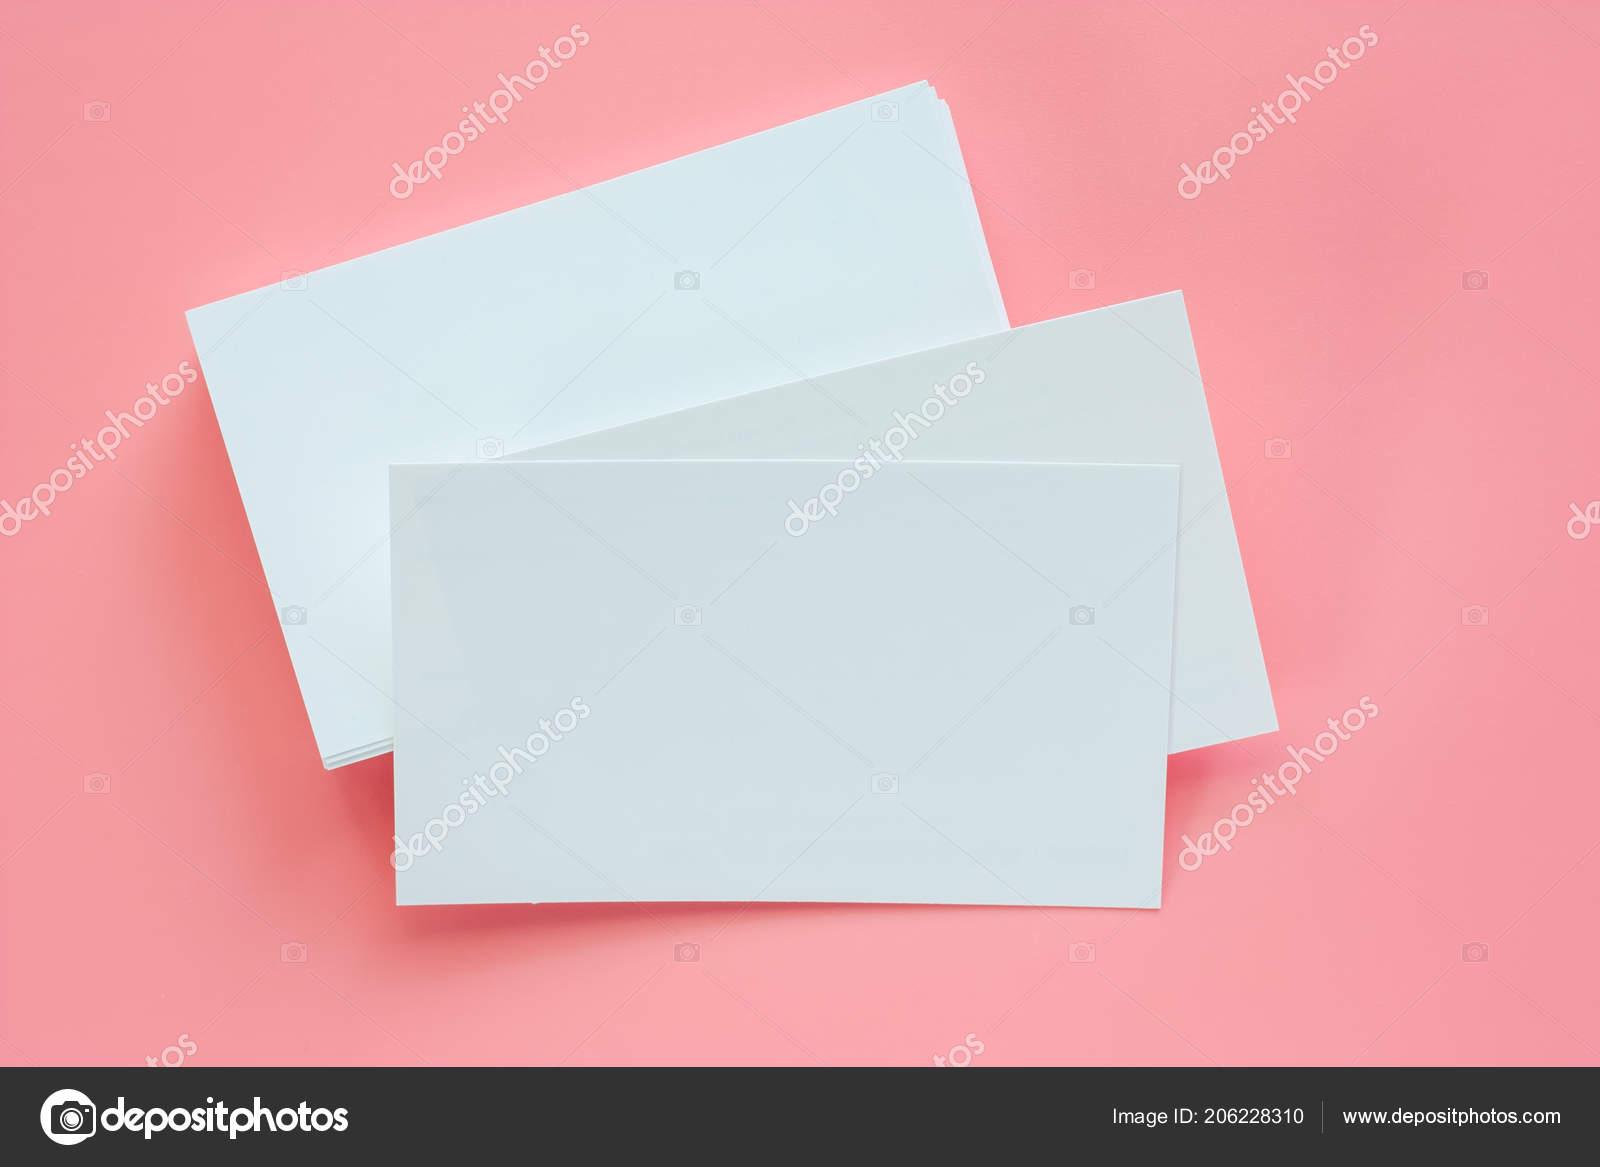 Leere Visitenkarten Auf Rosa Hintergrund Stockfoto